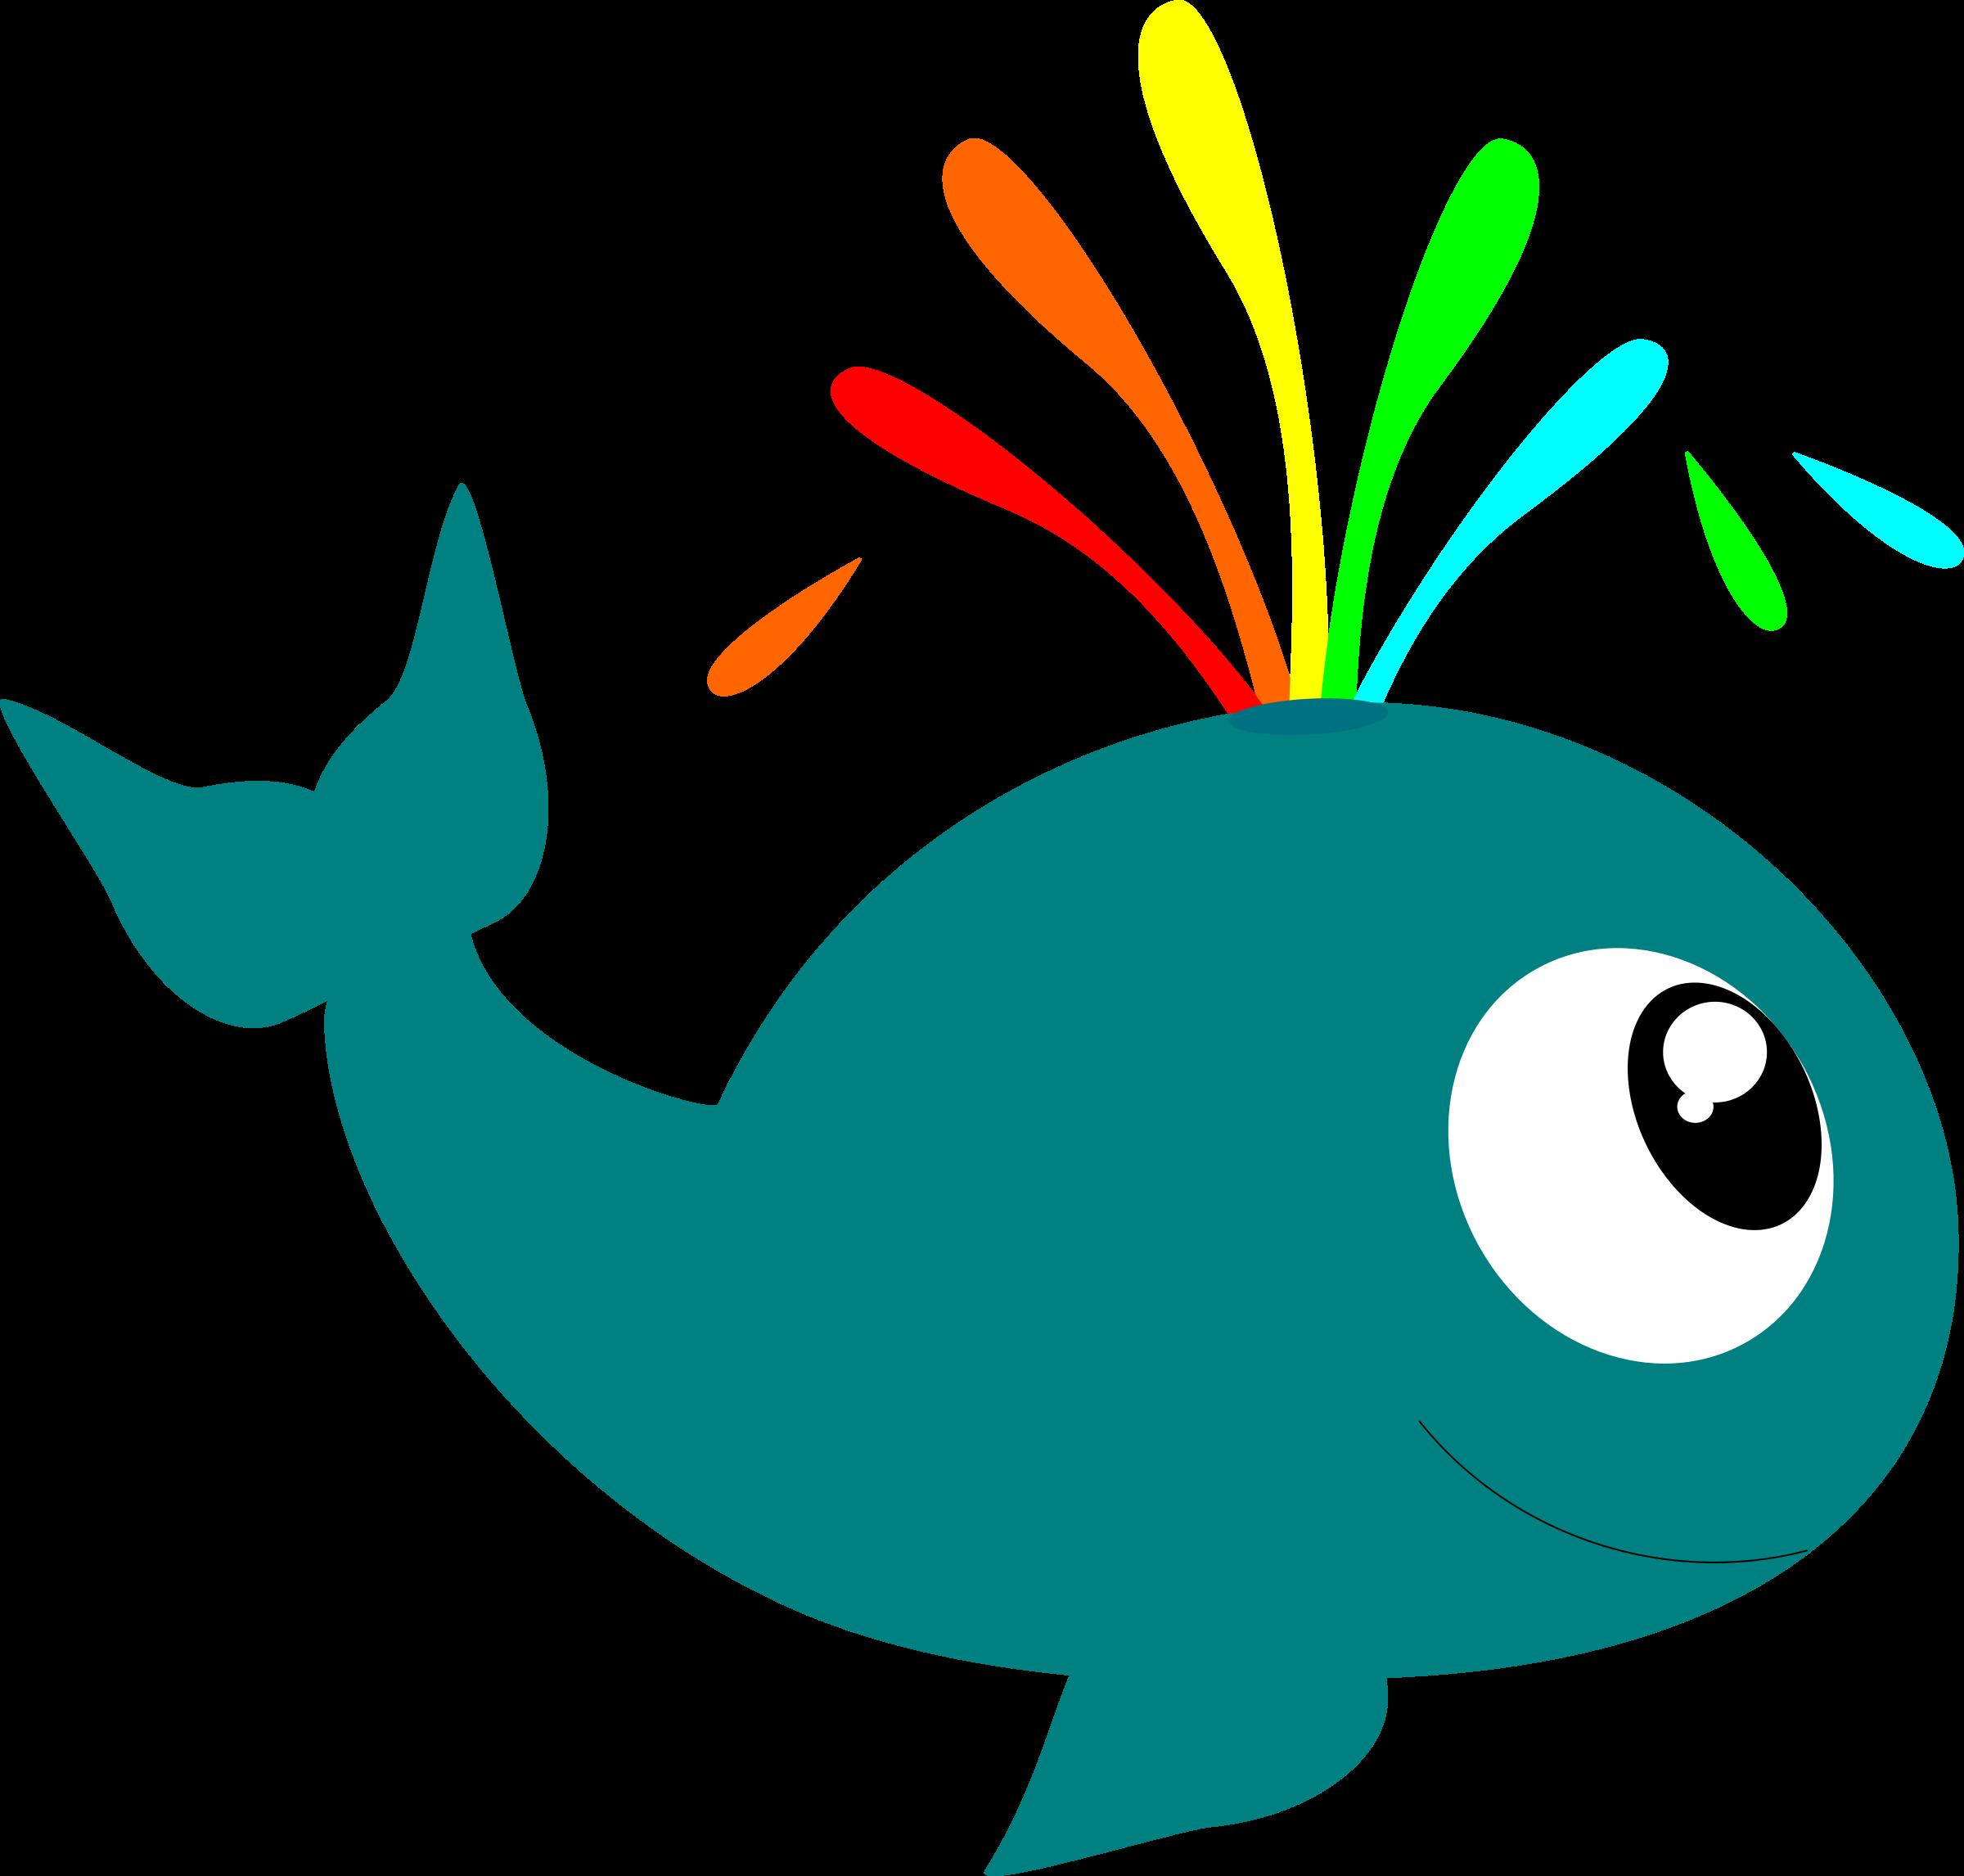 Deep sea fish clipart jpg transparent library Aquatic animal Deep sea creature Whale Clip art - whale 2400*2292 ... jpg transparent library